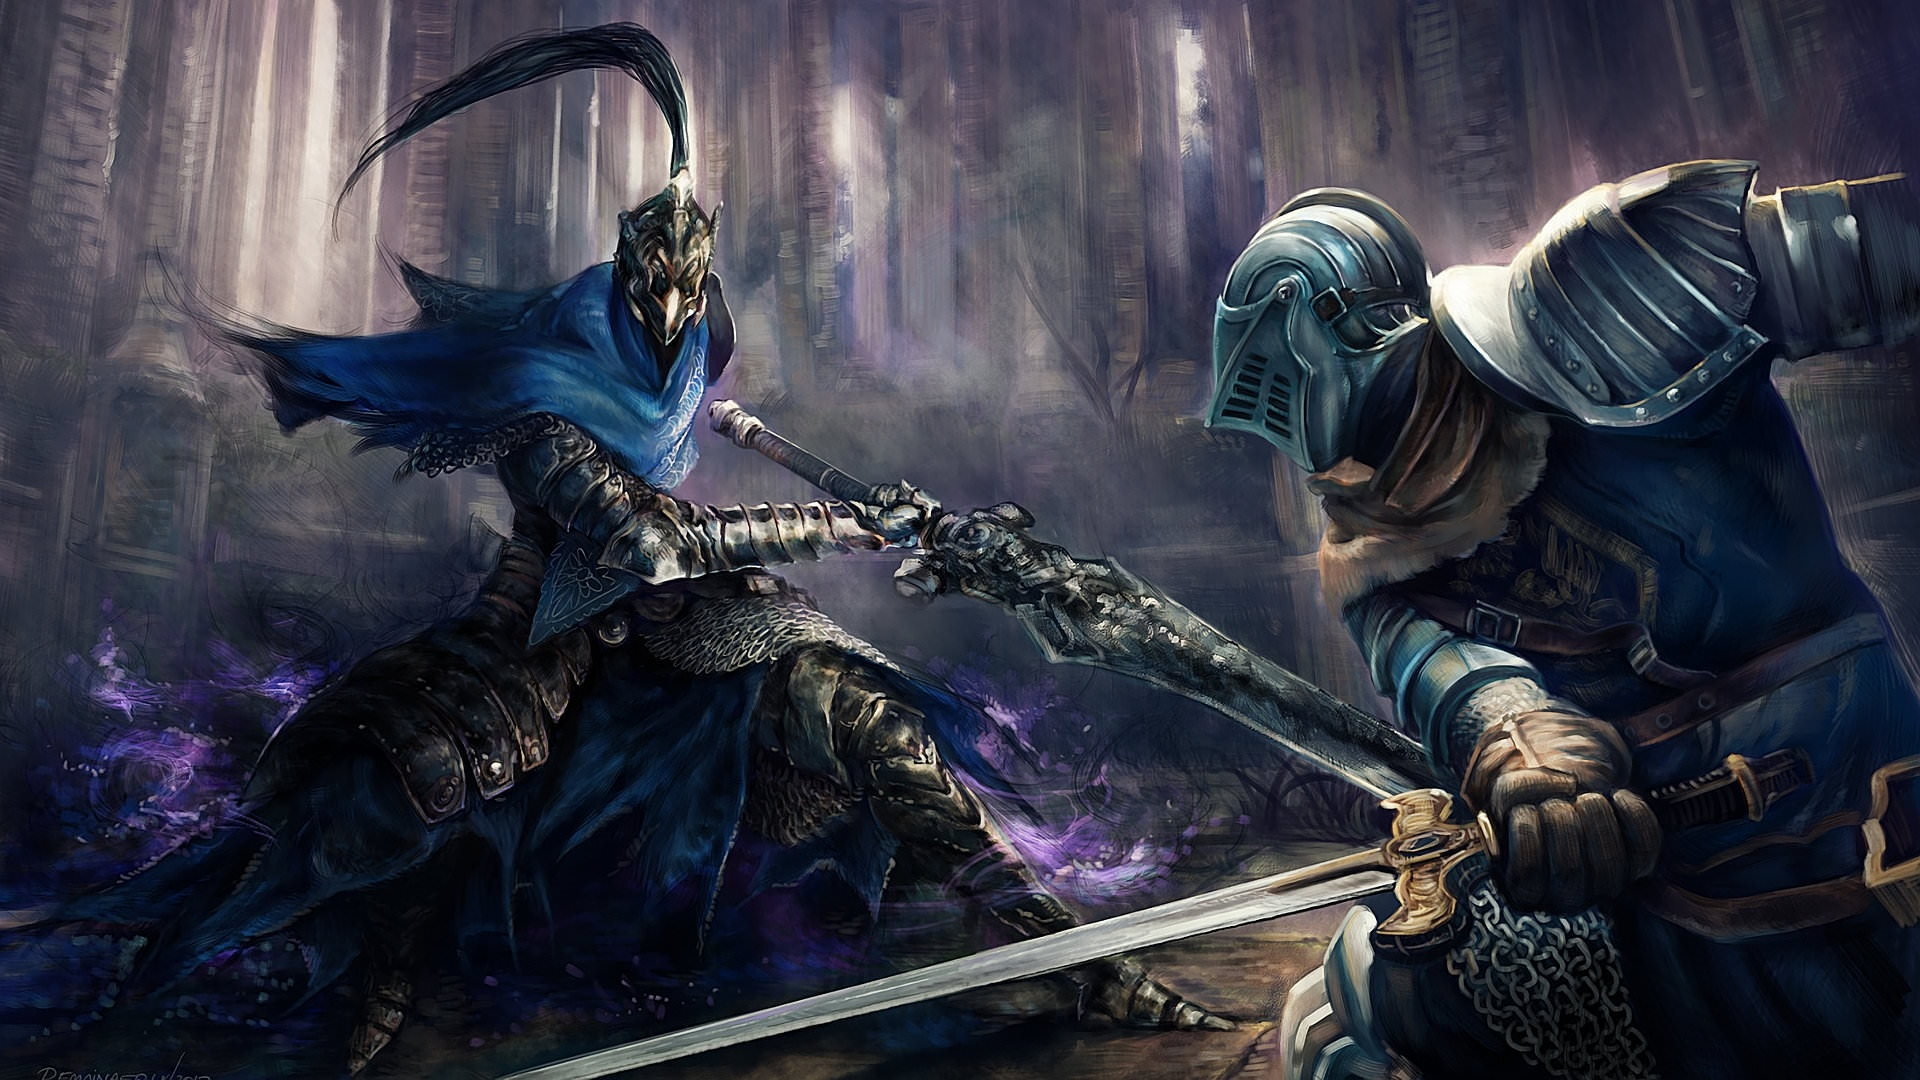 Dark Souls 3 free image